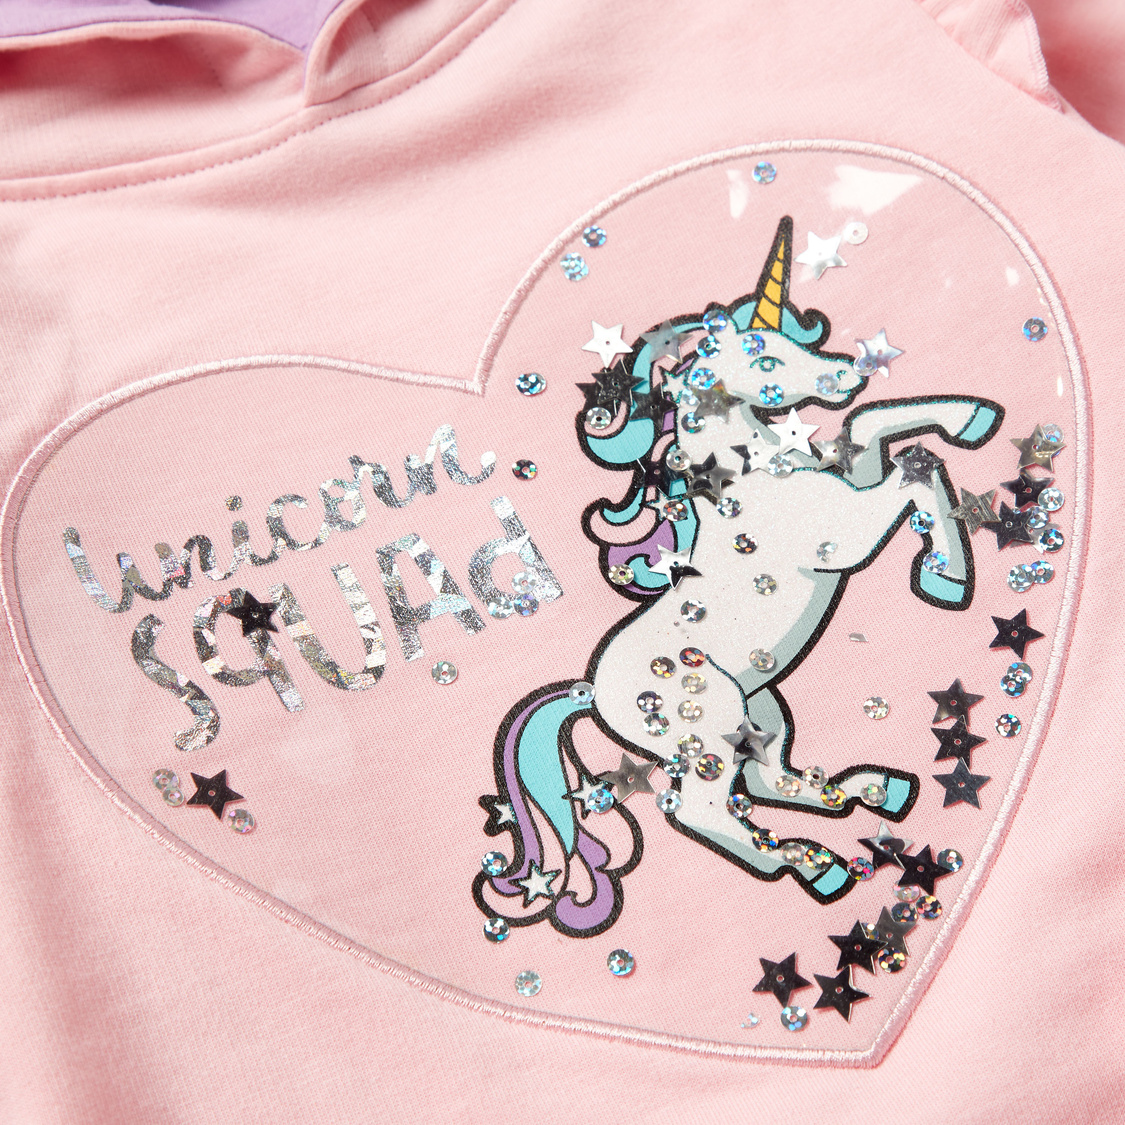 Unicorn Print Hooded Sweatshirt and Joggers Set